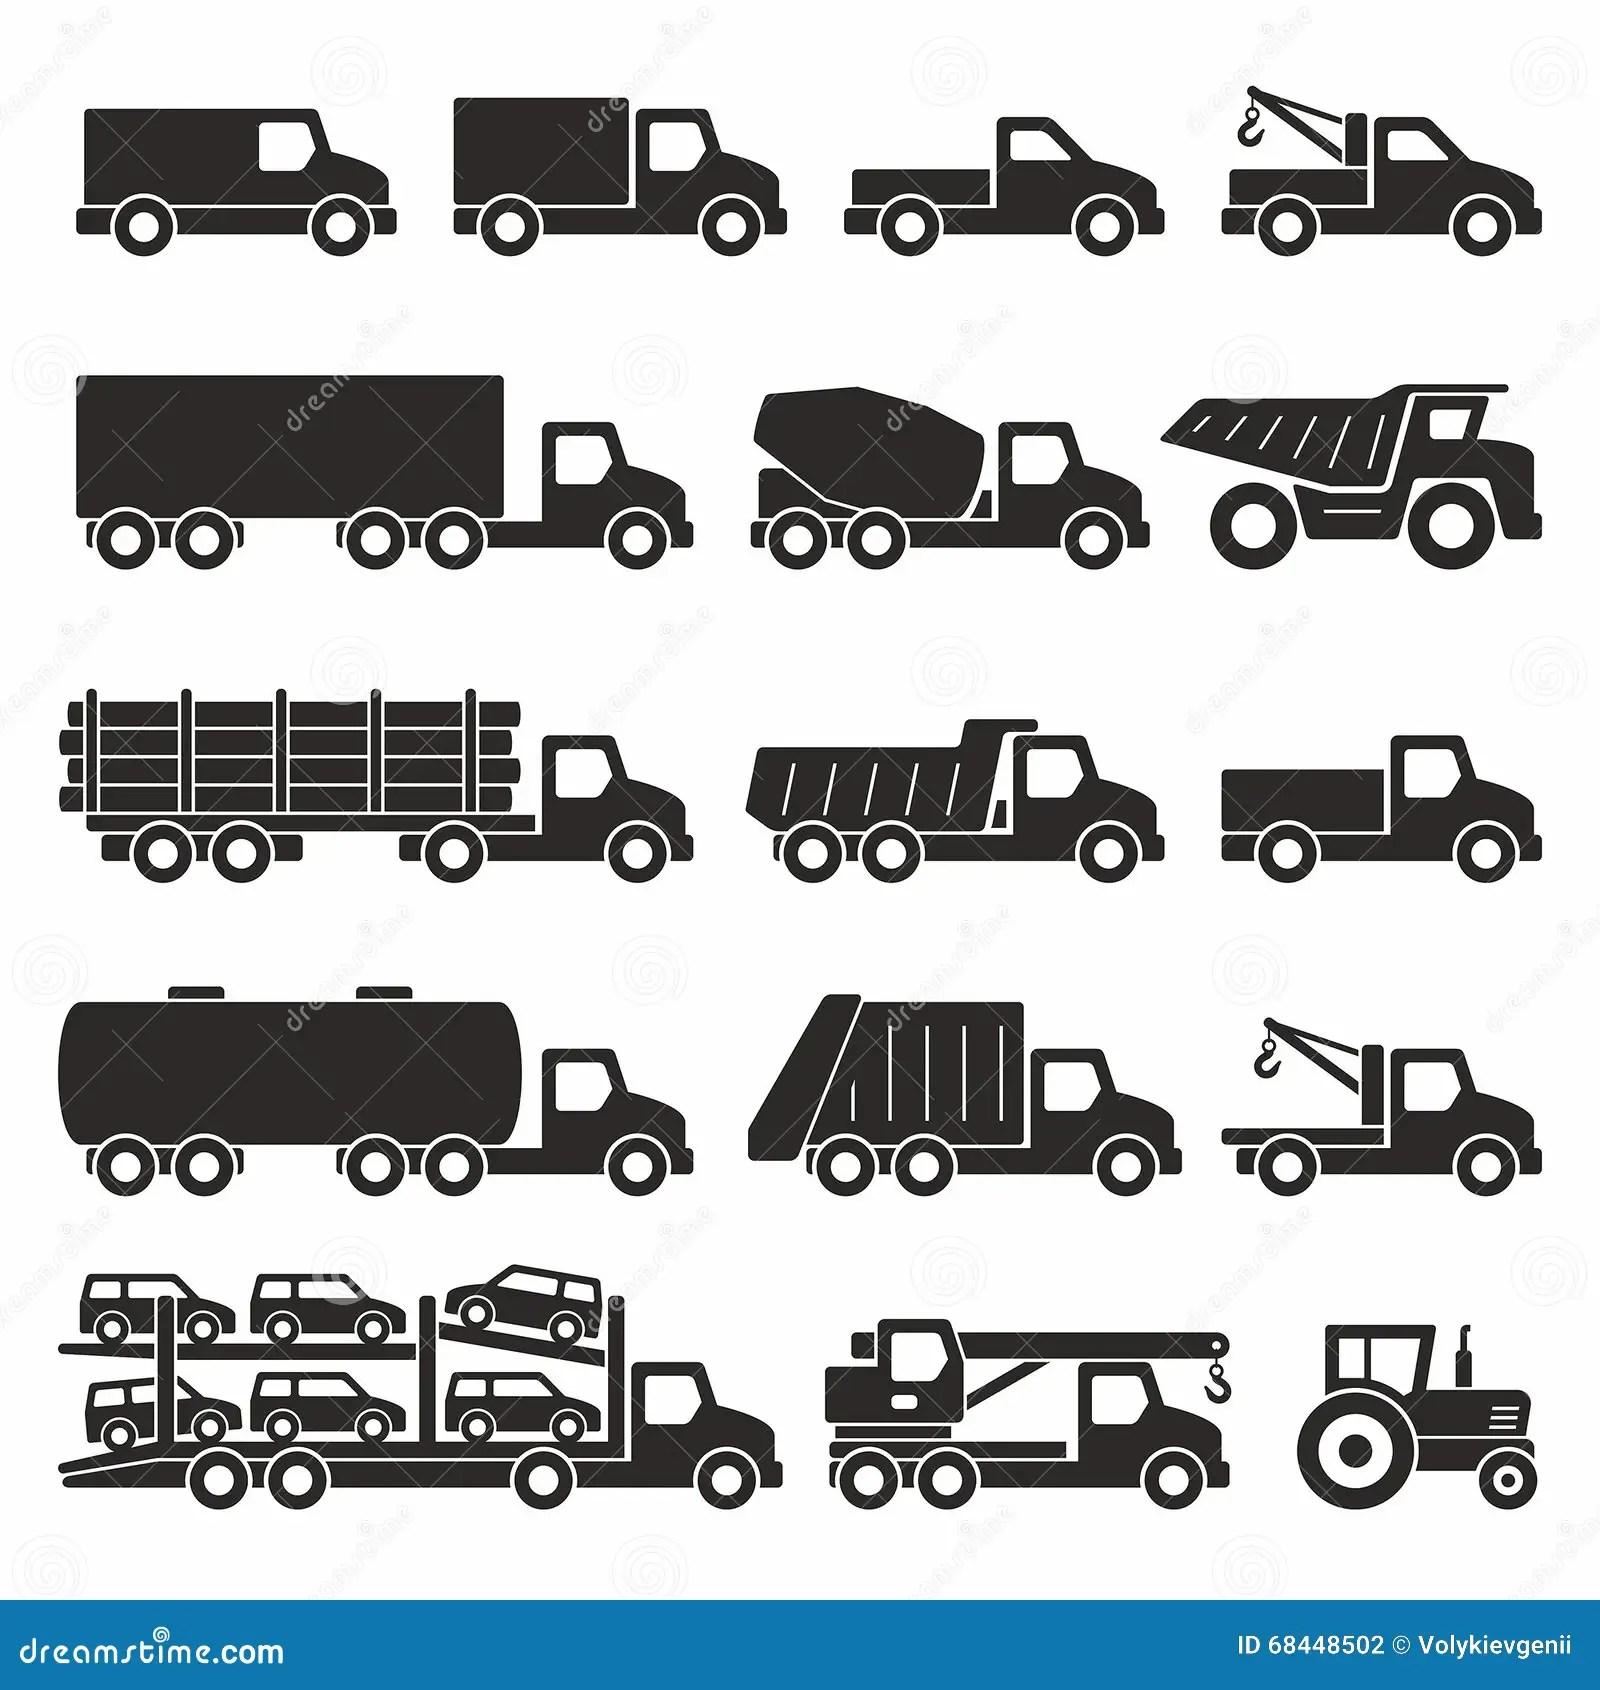 Trucks icons set stock vector. Illustration of mixer